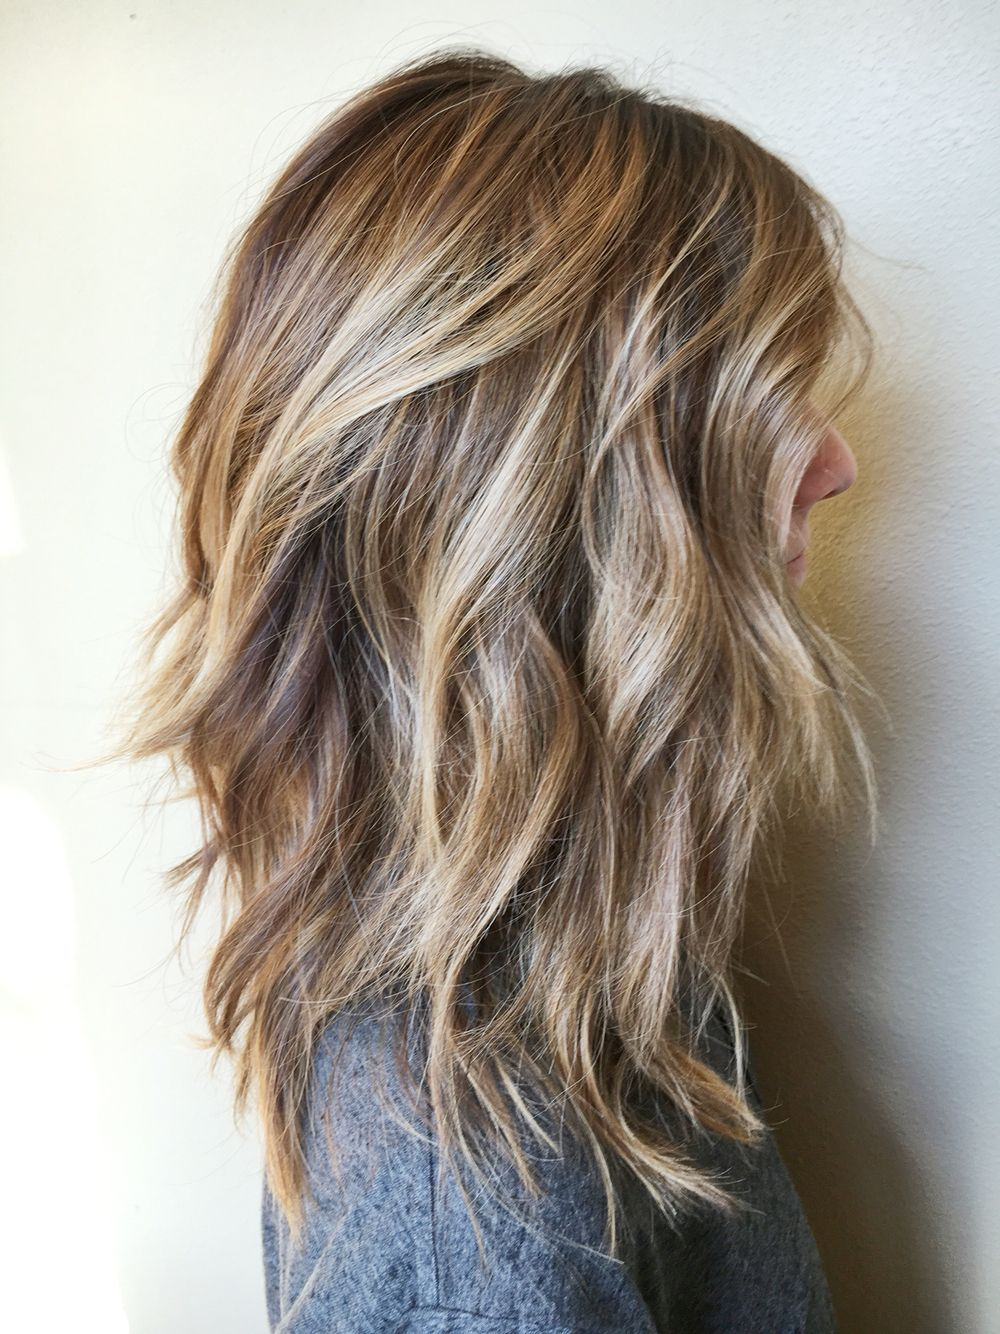 Pin by stephanie bayag on hair pinterest balayage messy curls